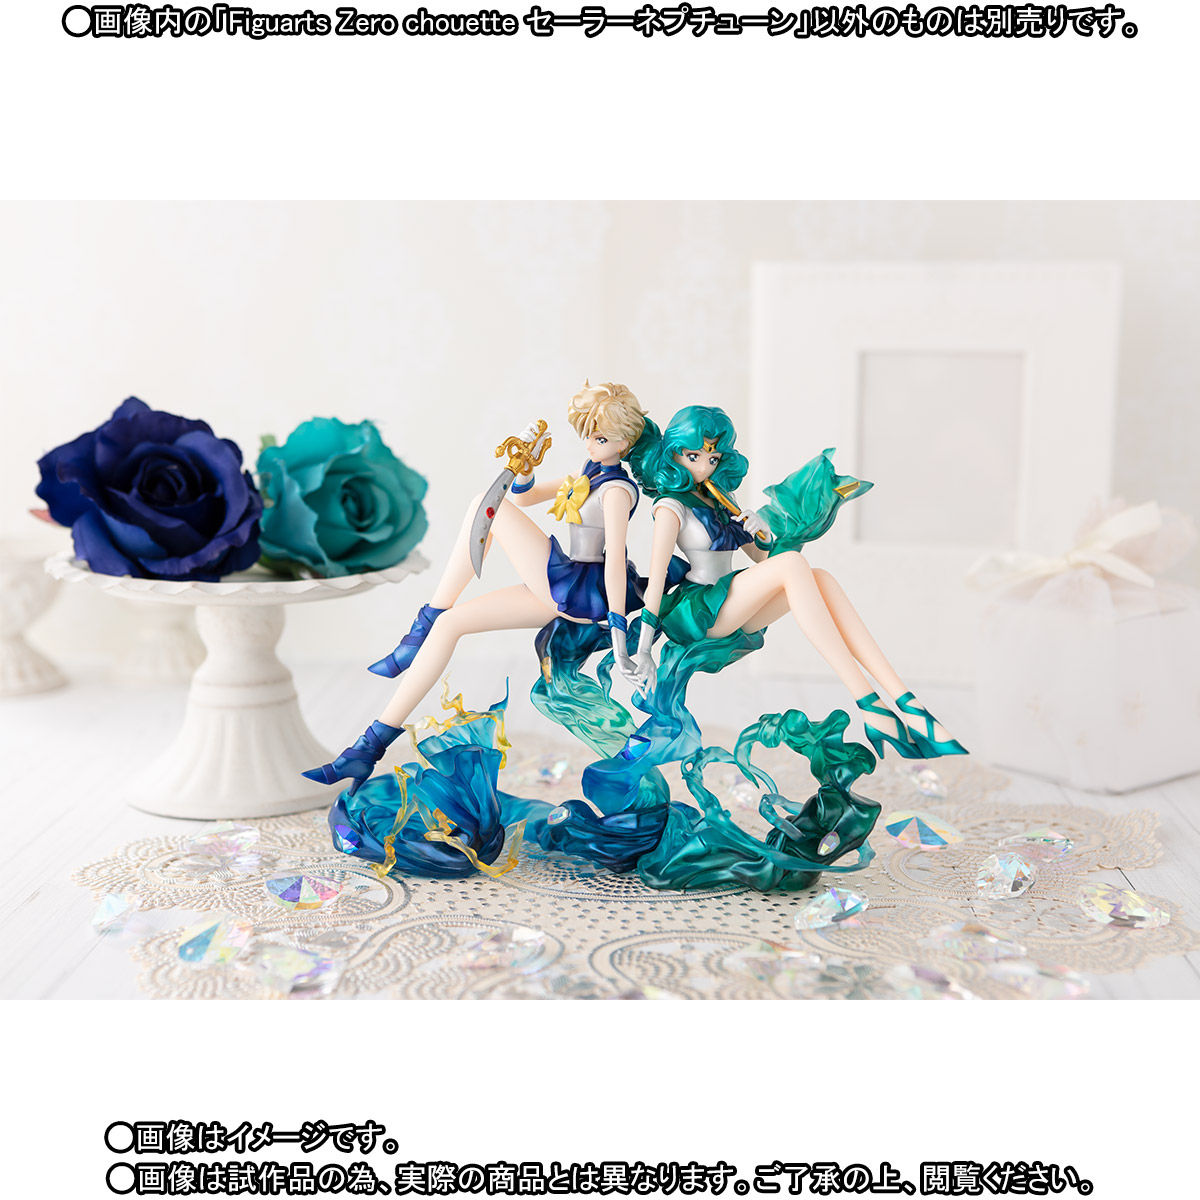 Figuarts Zero chouette『セーラーネプチューン』美少女戦士セーラームーン 完成品フィギュア-007